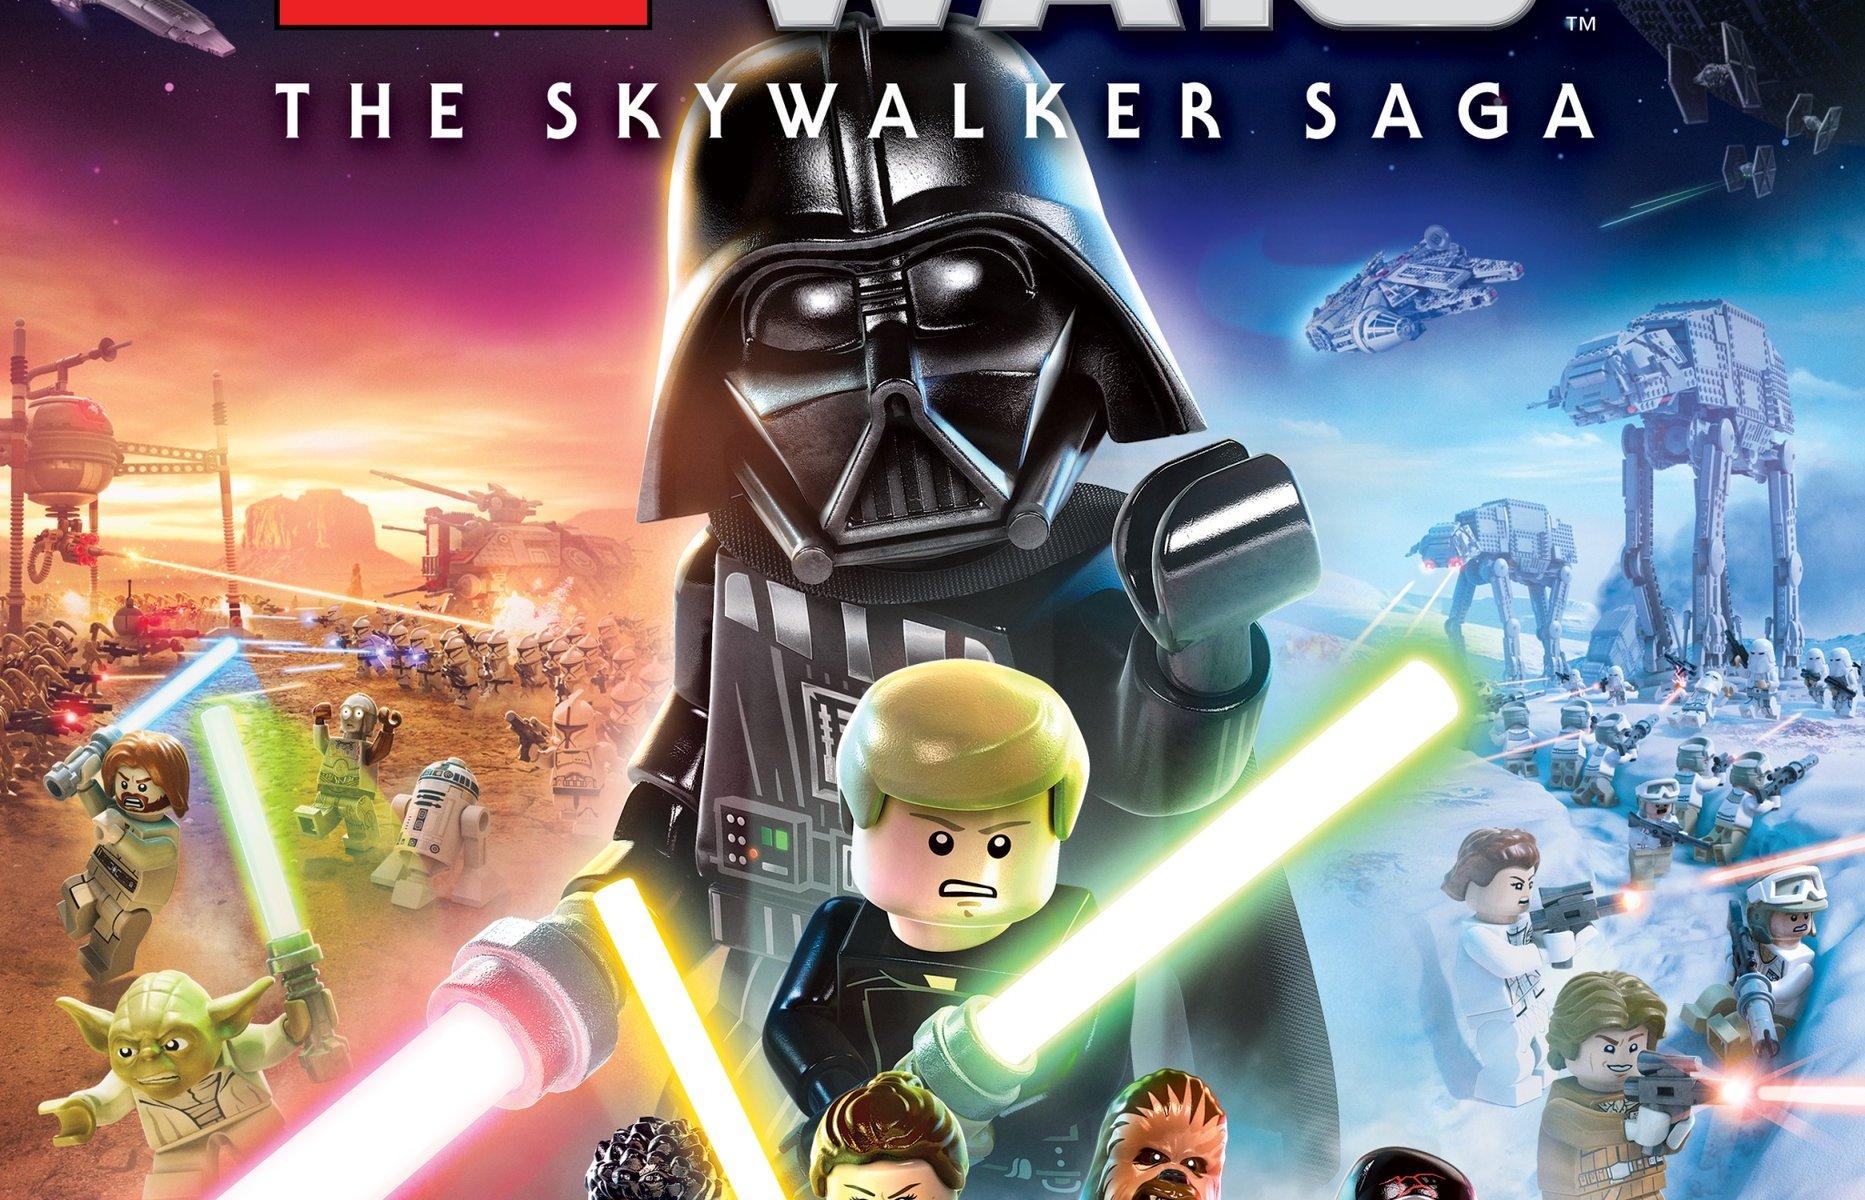 Tt Games Reveals Key Art For Lego Star Wars The Skywalker Saga My Nintendo News